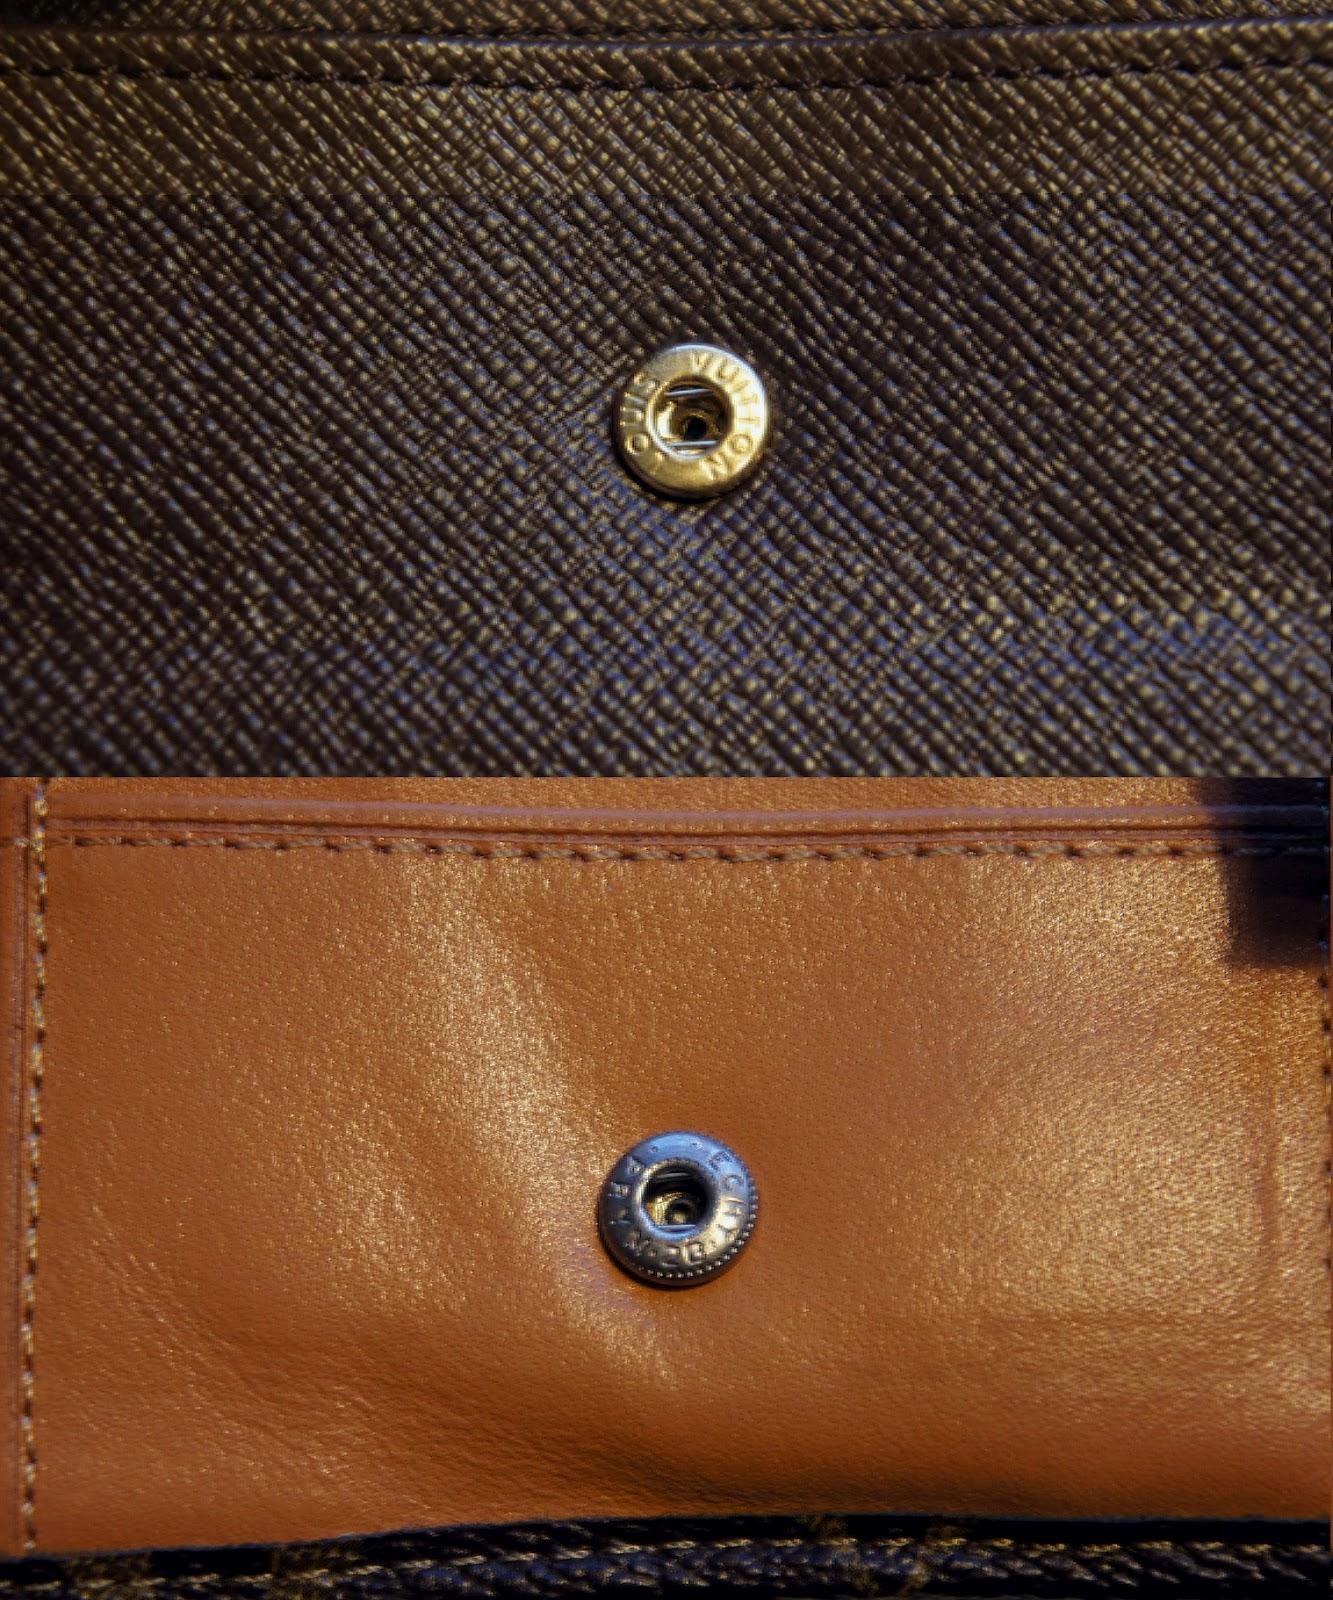 7e42b44cc541 The real button says  Louis Vuitton